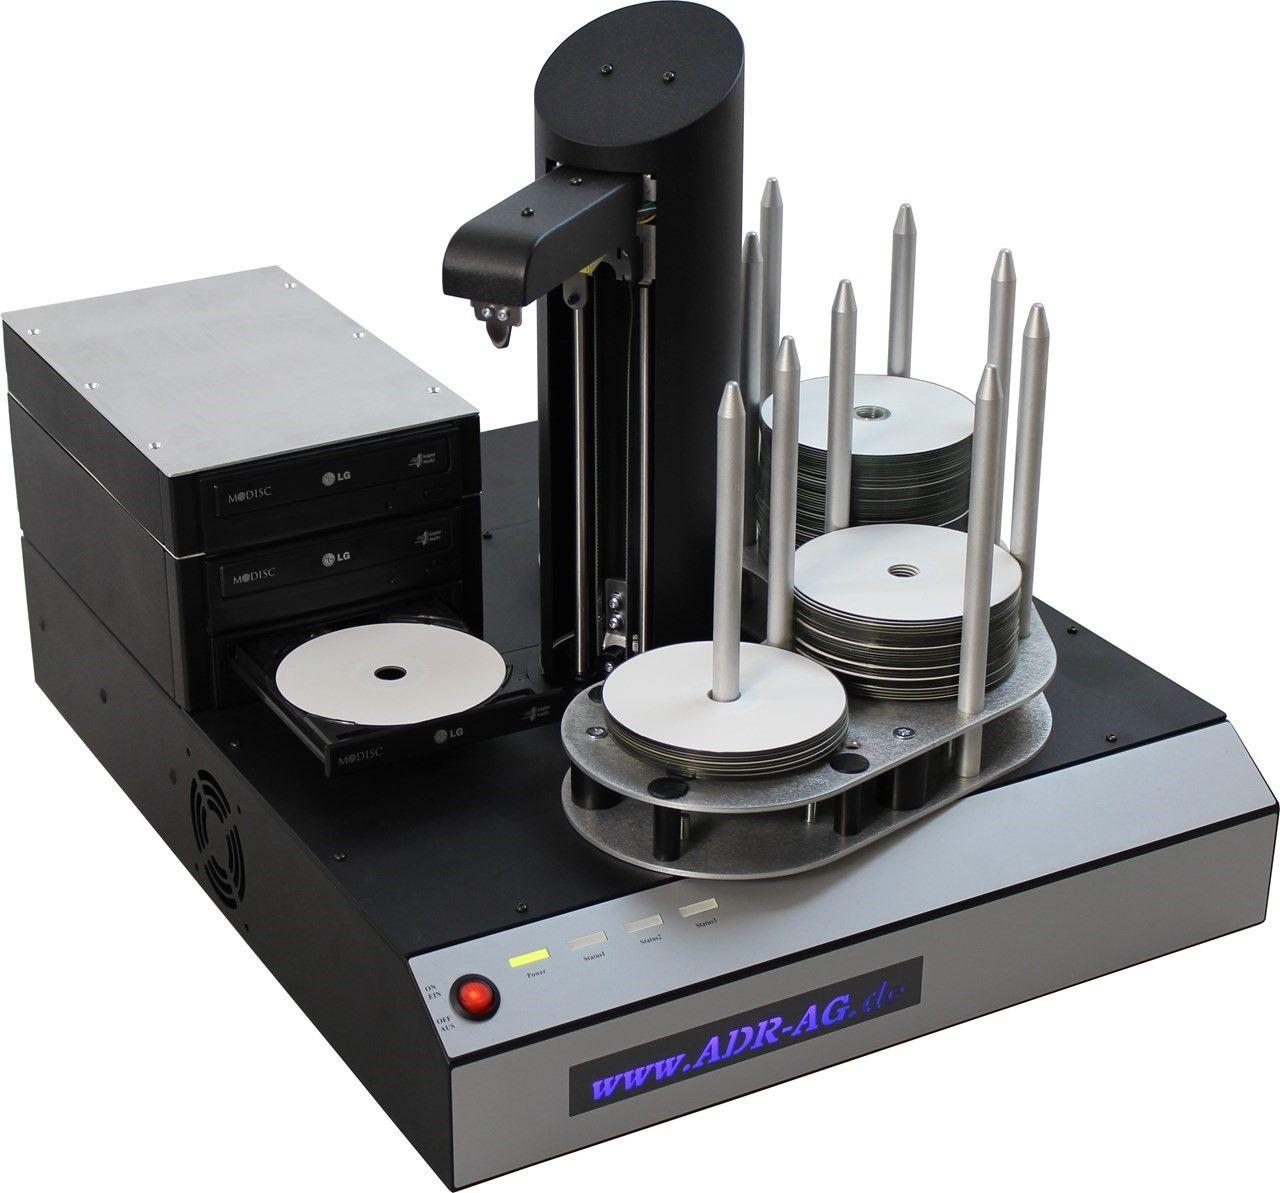 Machines de duplication de disques optiques